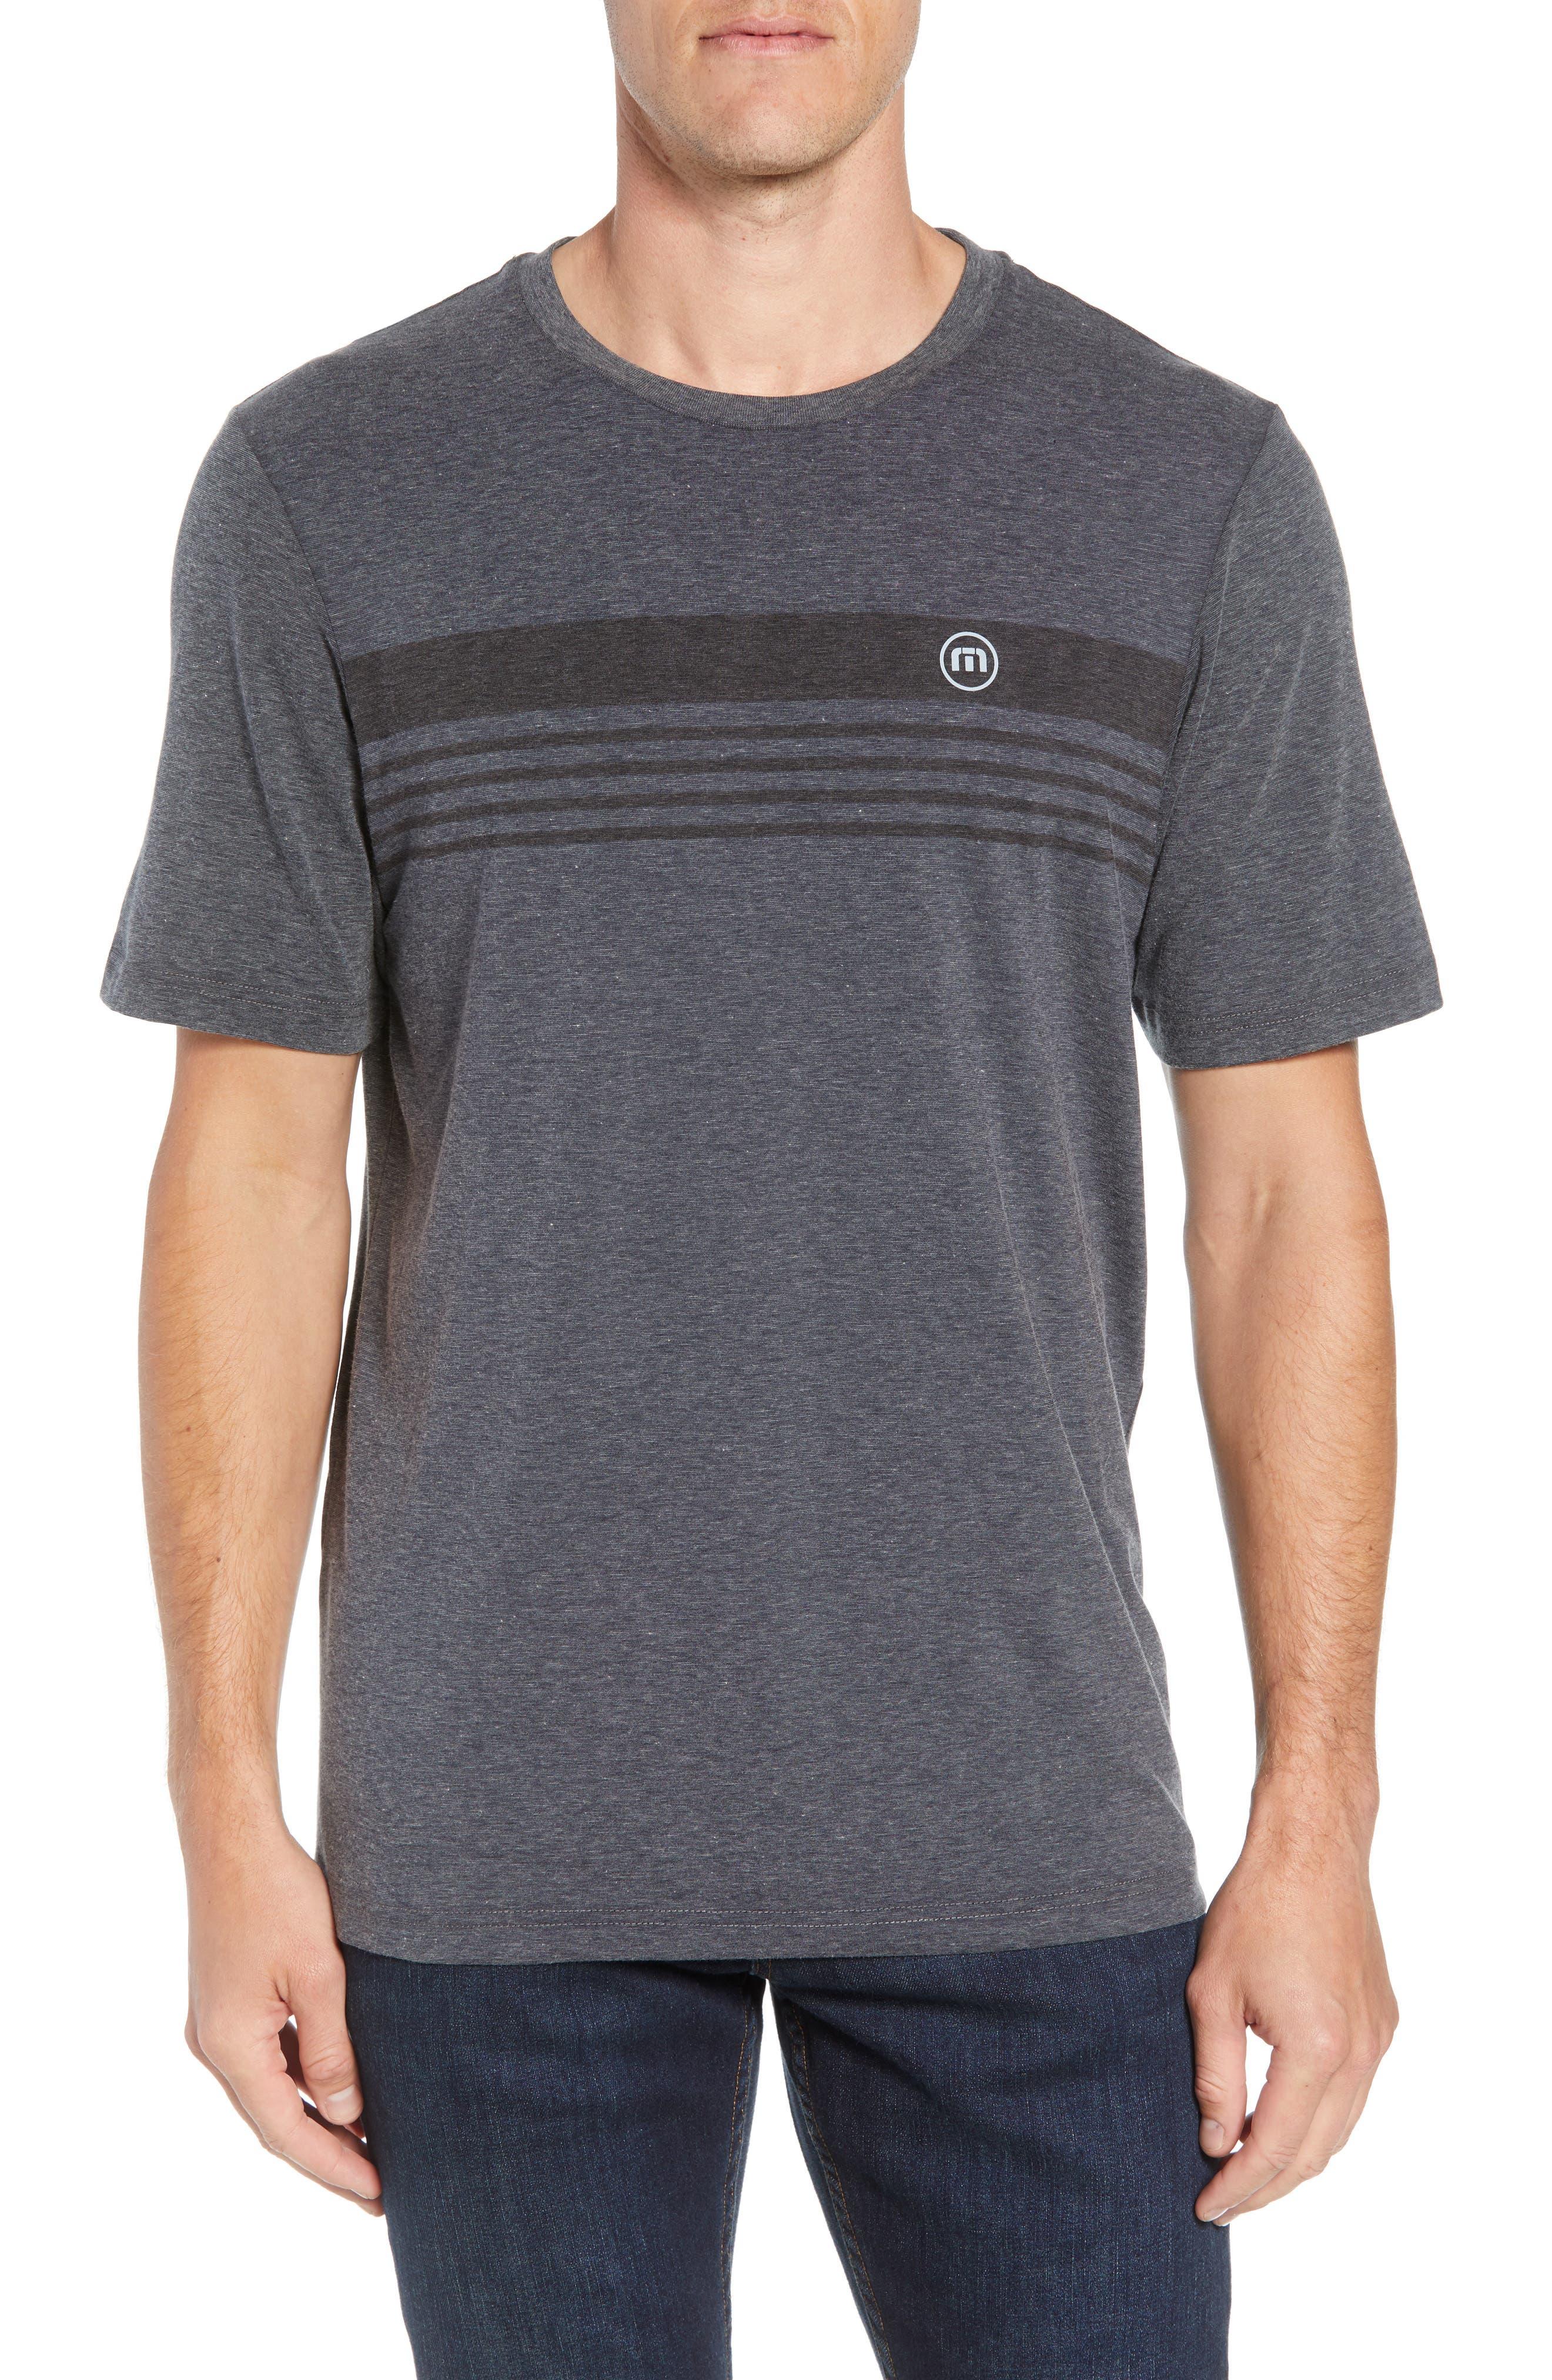 Recline Performance T-Shirt,                             Main thumbnail 1, color,                             HEATHER MAGNET